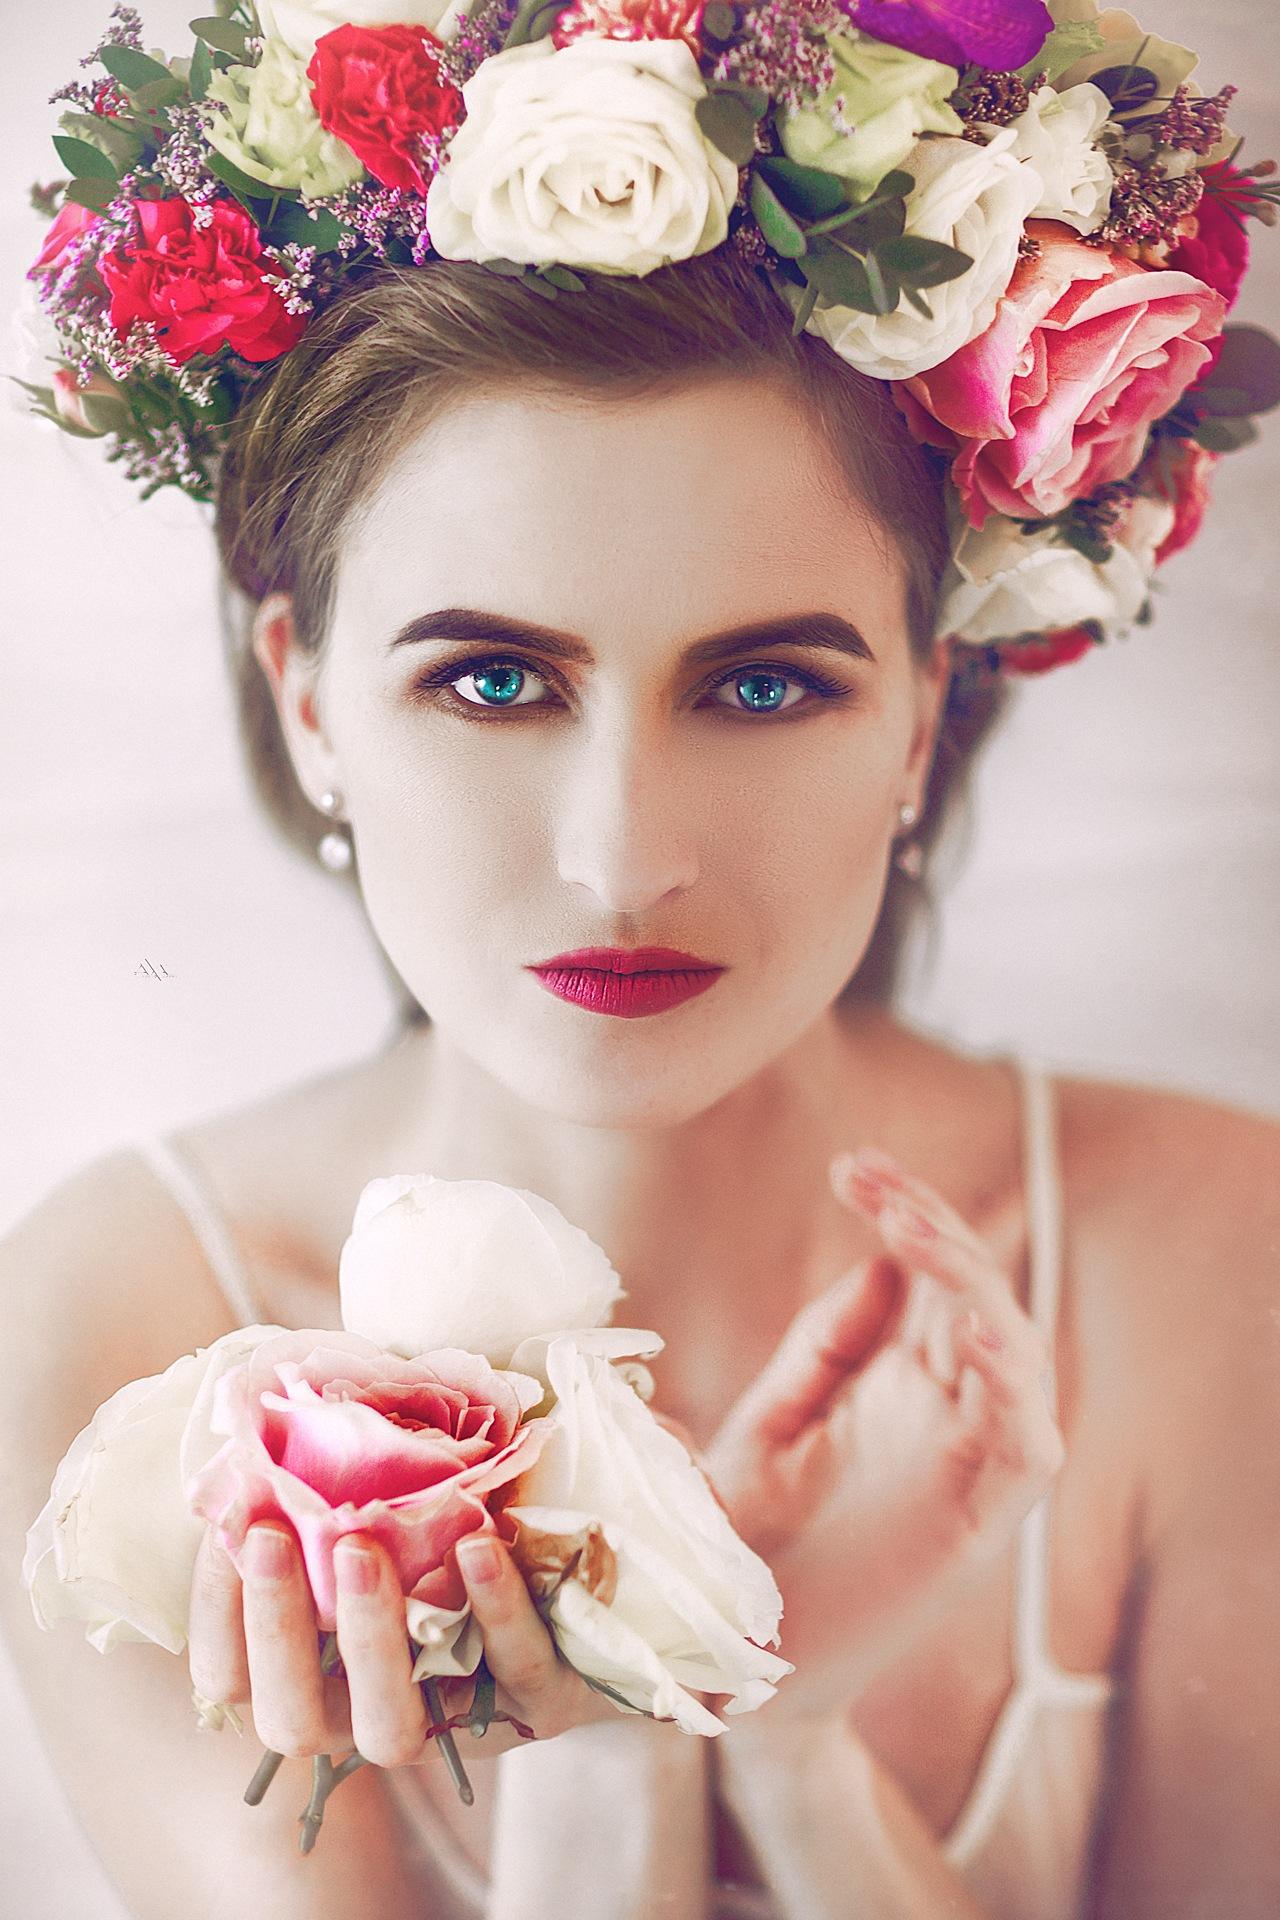 Freya  by Ruslan  Bolgov (Axe Photography)